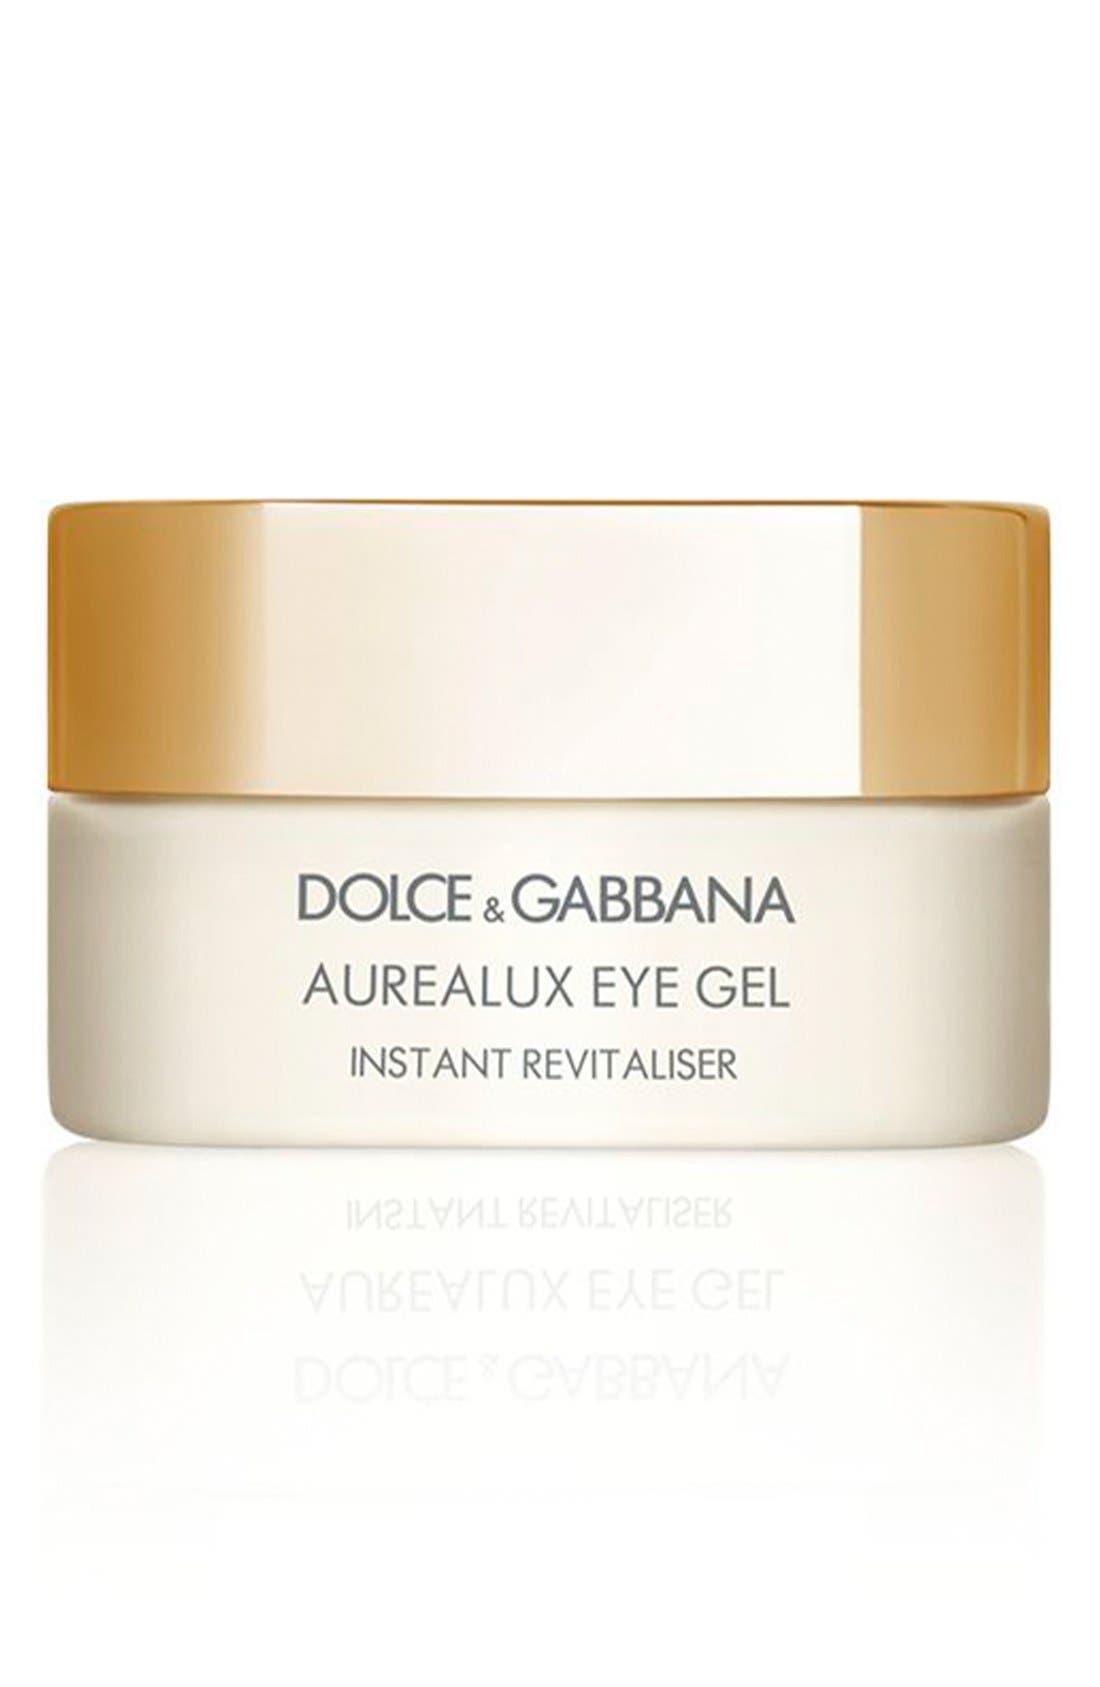 'Aurealux' Eye Gel Instant Revitaliser,                             Main thumbnail 1, color,                             000